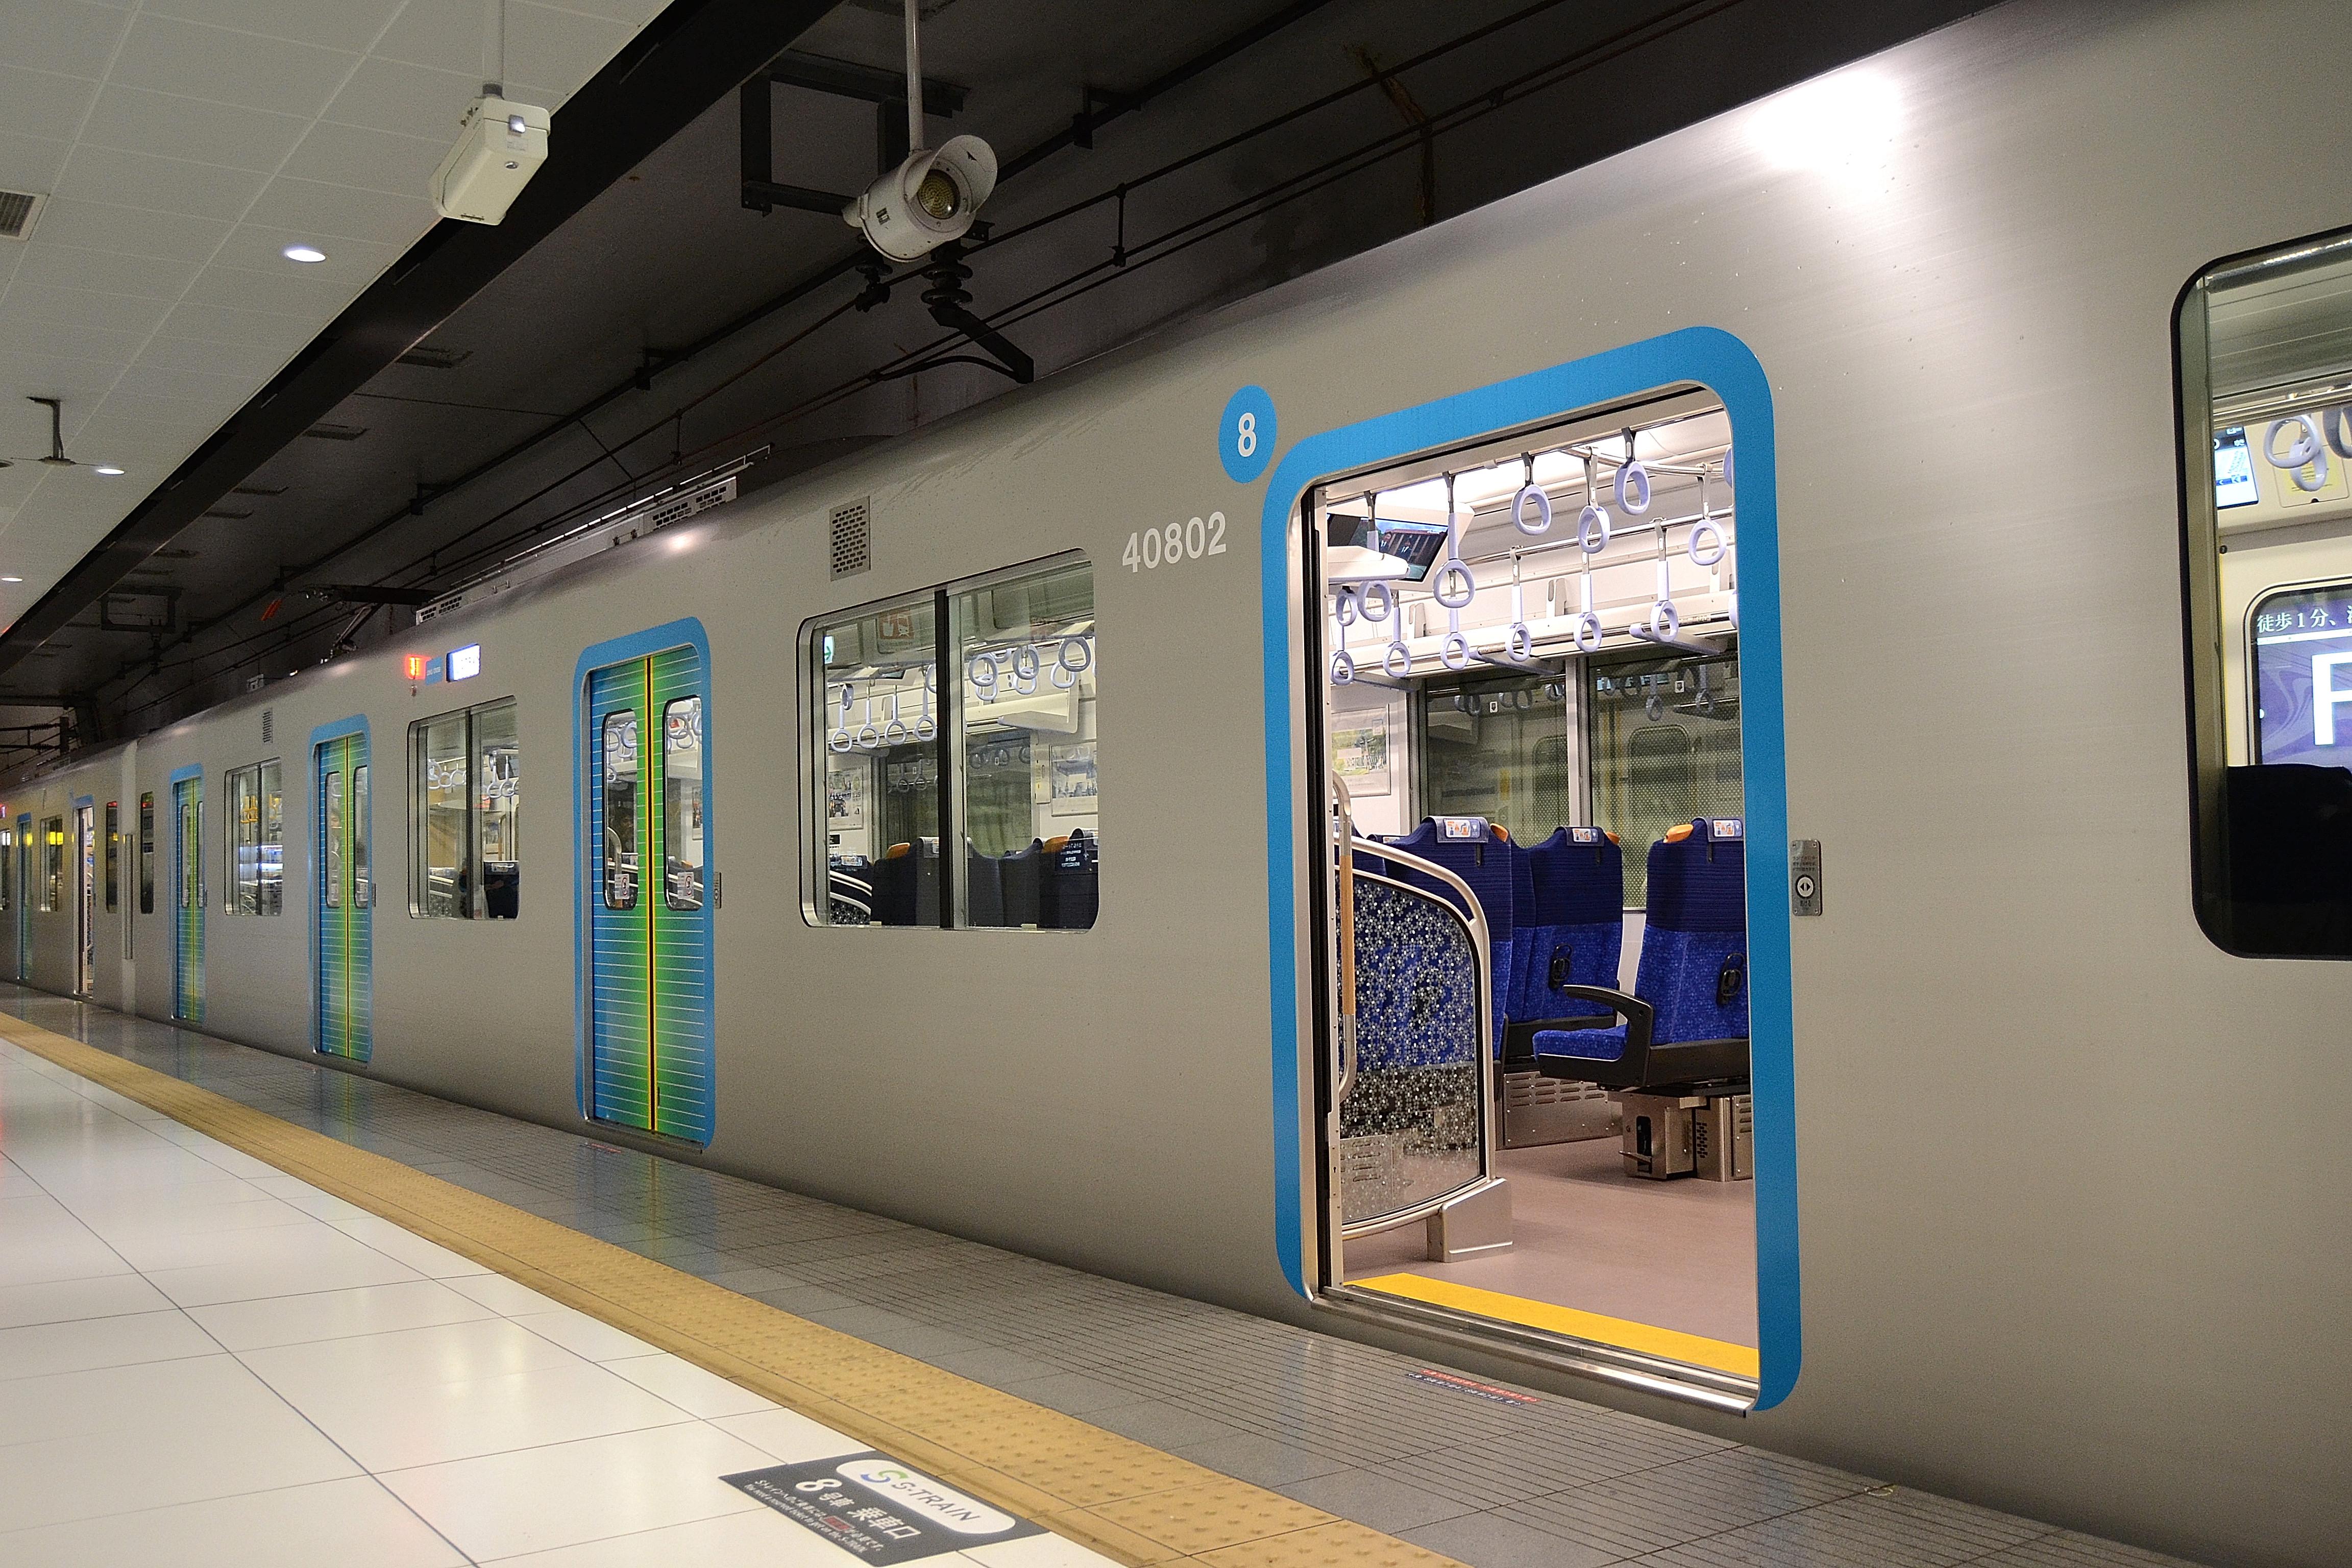 https://upload.wikimedia.org/wikipedia/commons/d/d4/40000kei_Motomachi-Ch%C5%ABkagai_station_train_door.jpg